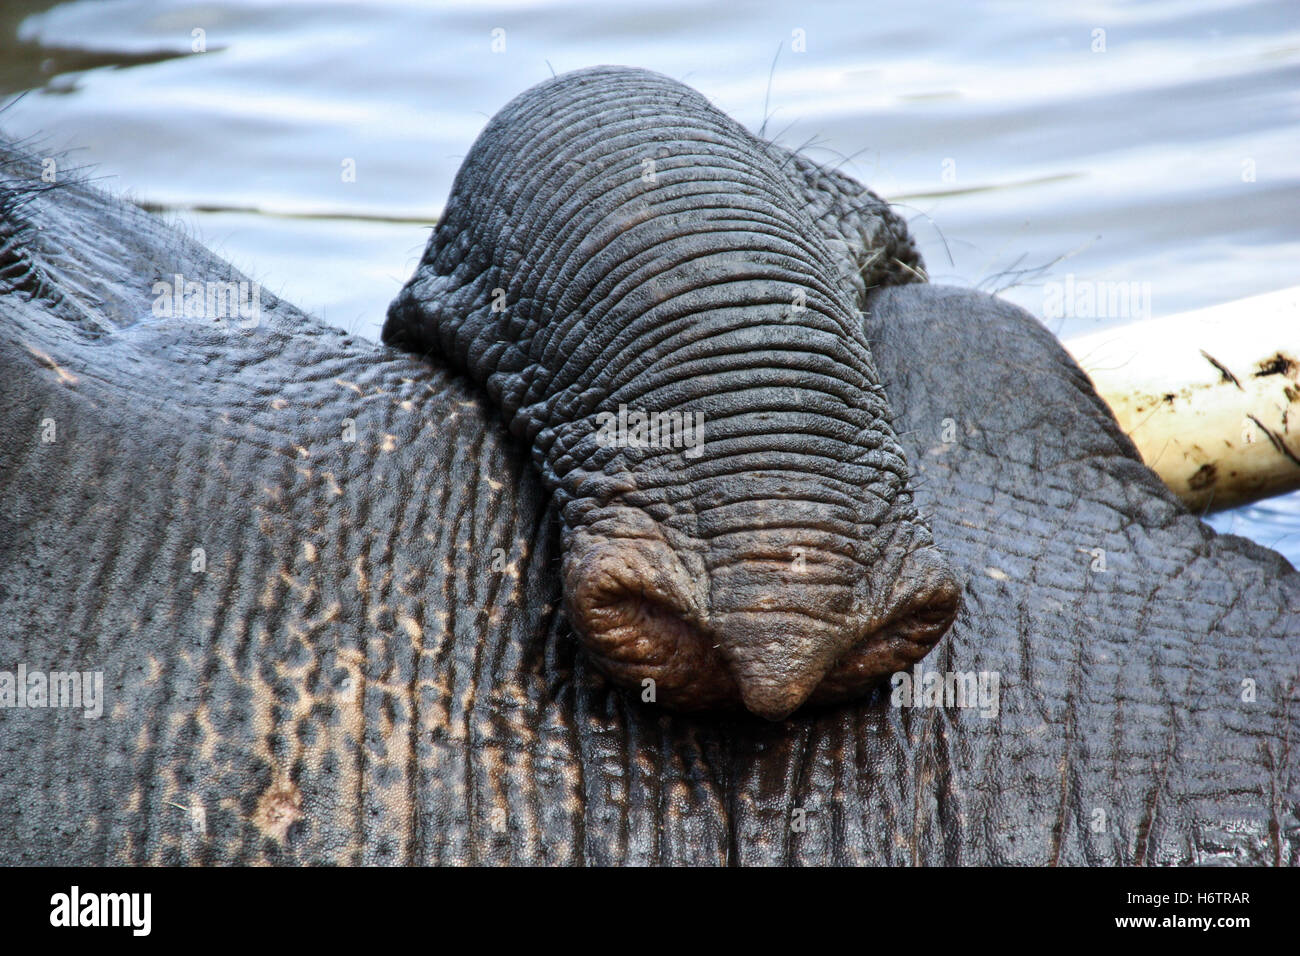 detail animal elephant tusk tame pictogram symbol pictograph trade symbol age close travel macro close-up macro - Stock Image